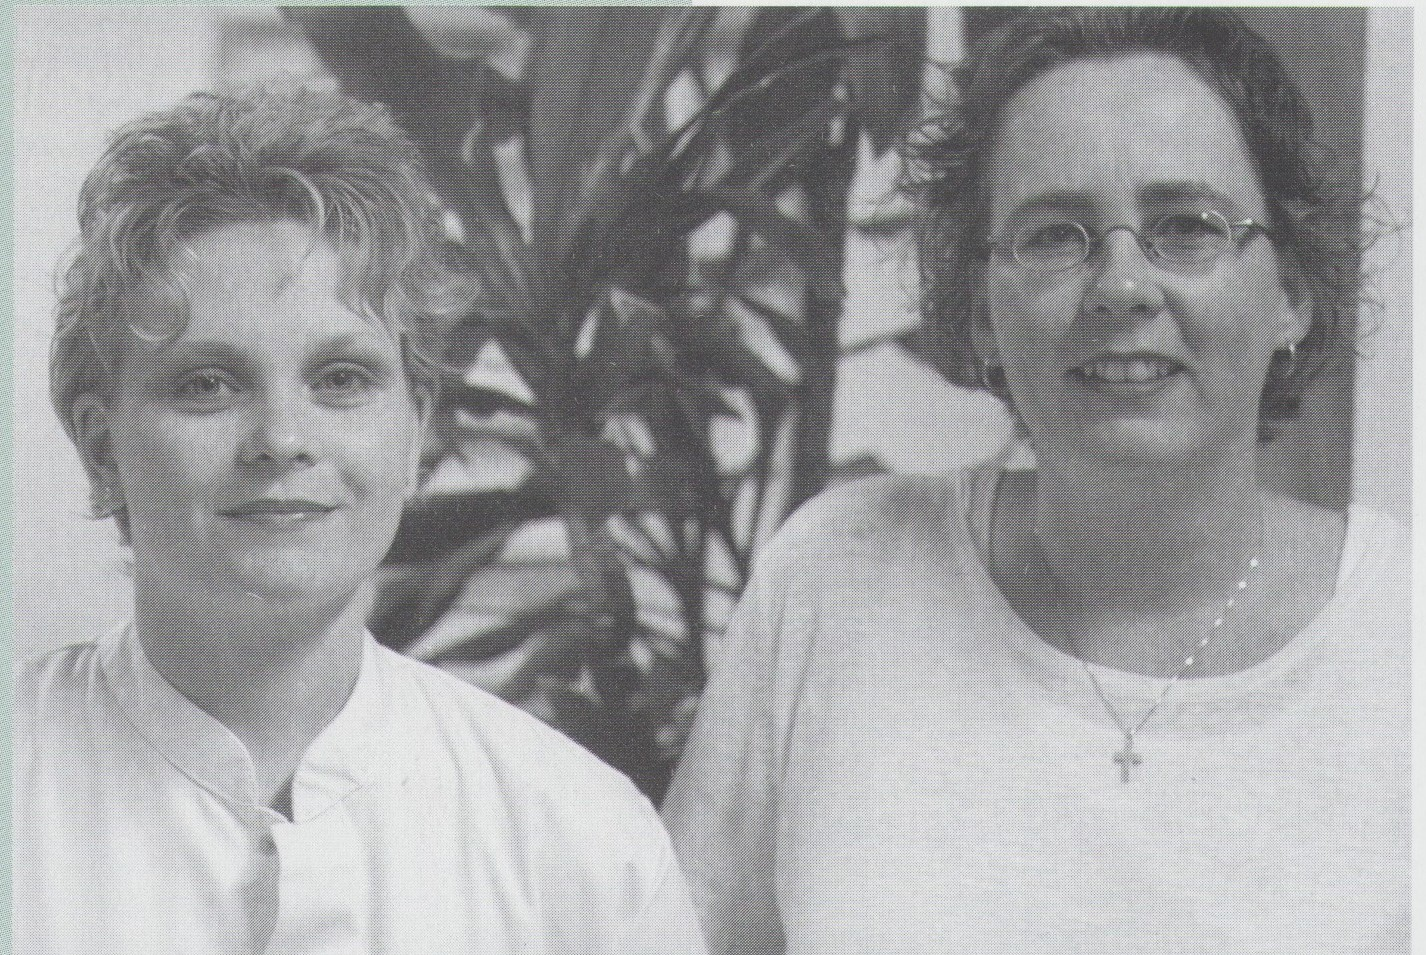 Fig. 8.9. Poliverpleegkundigen Anouk vd Kwaak en Jolan Hendriks 2001